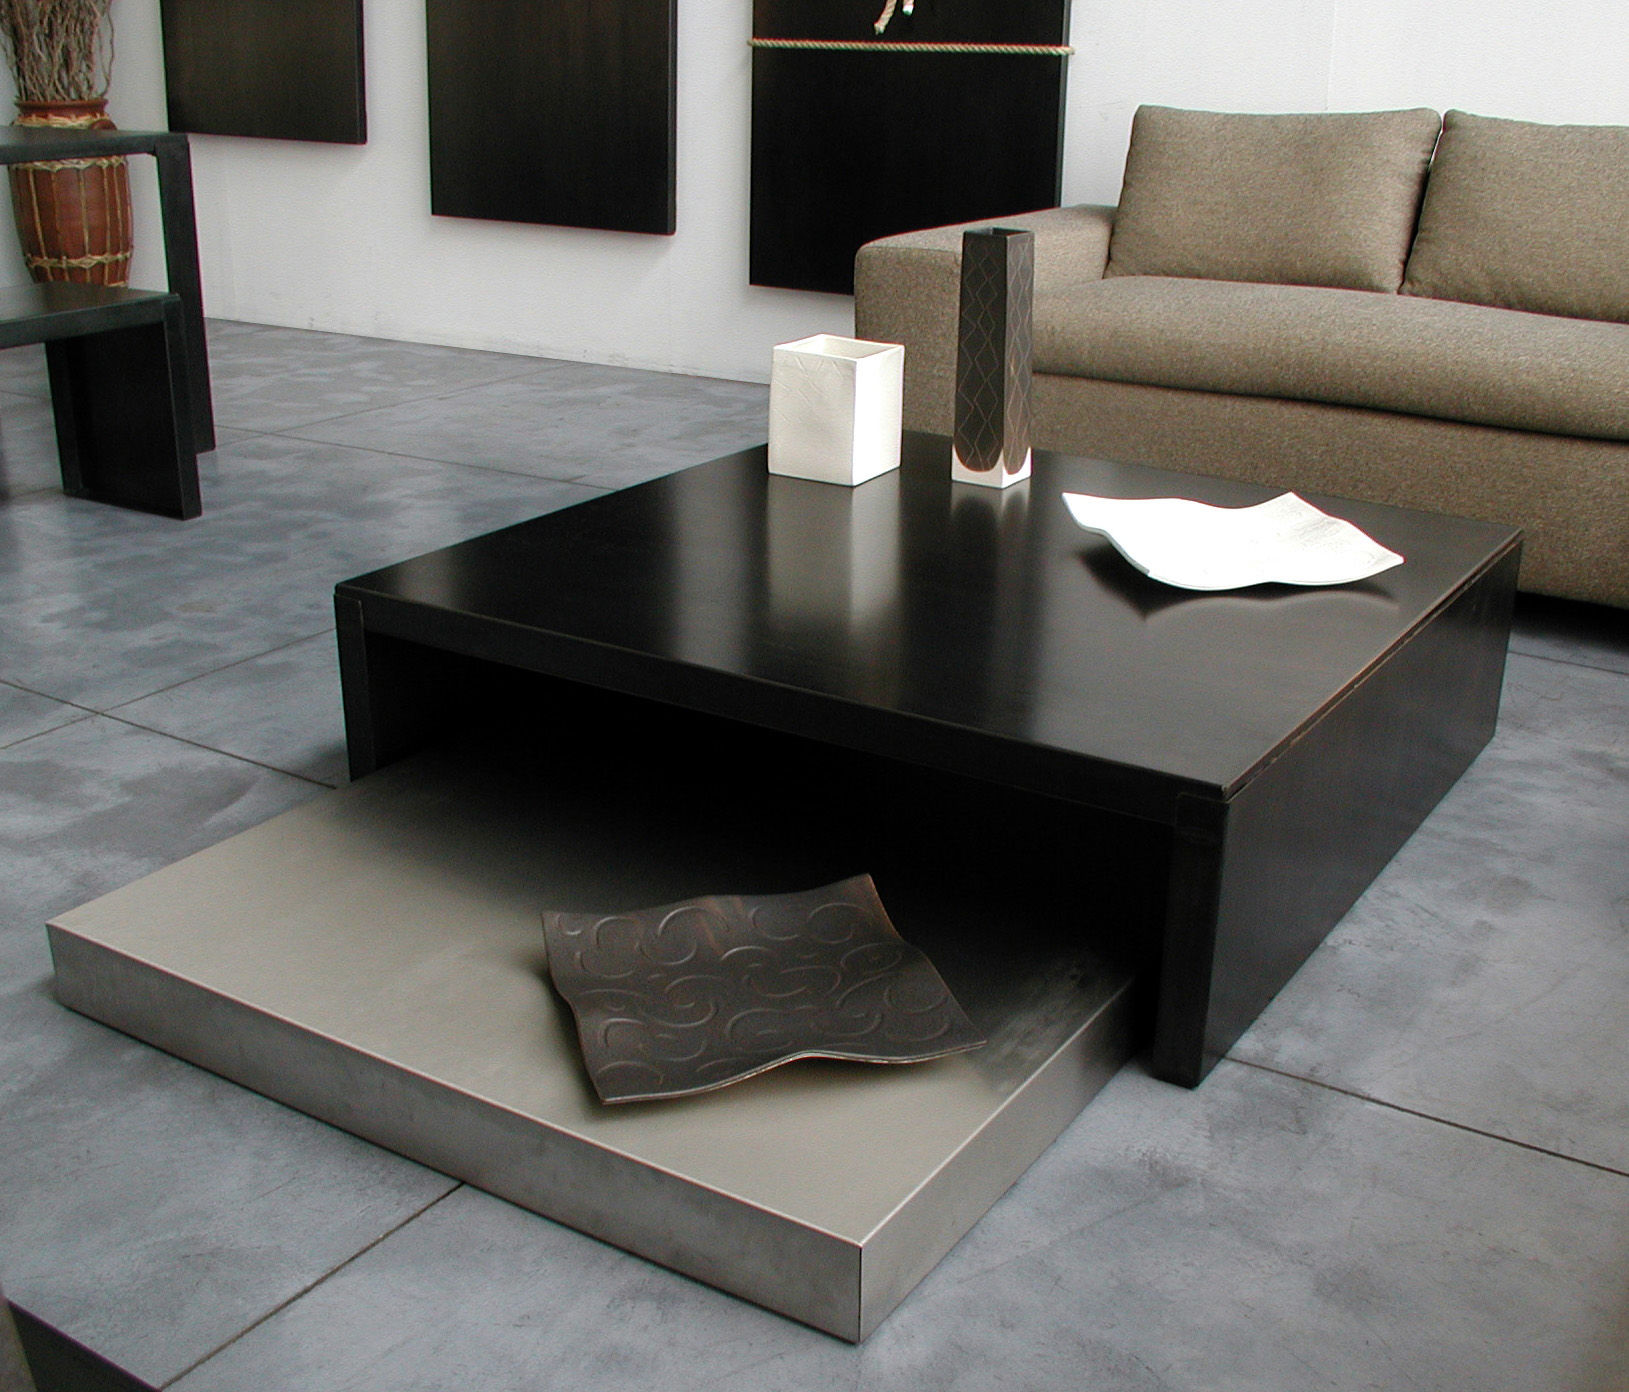 table basse max moritz acier phosphat noir acier phosphat noir et inox 100x100 cm zeus. Black Bedroom Furniture Sets. Home Design Ideas